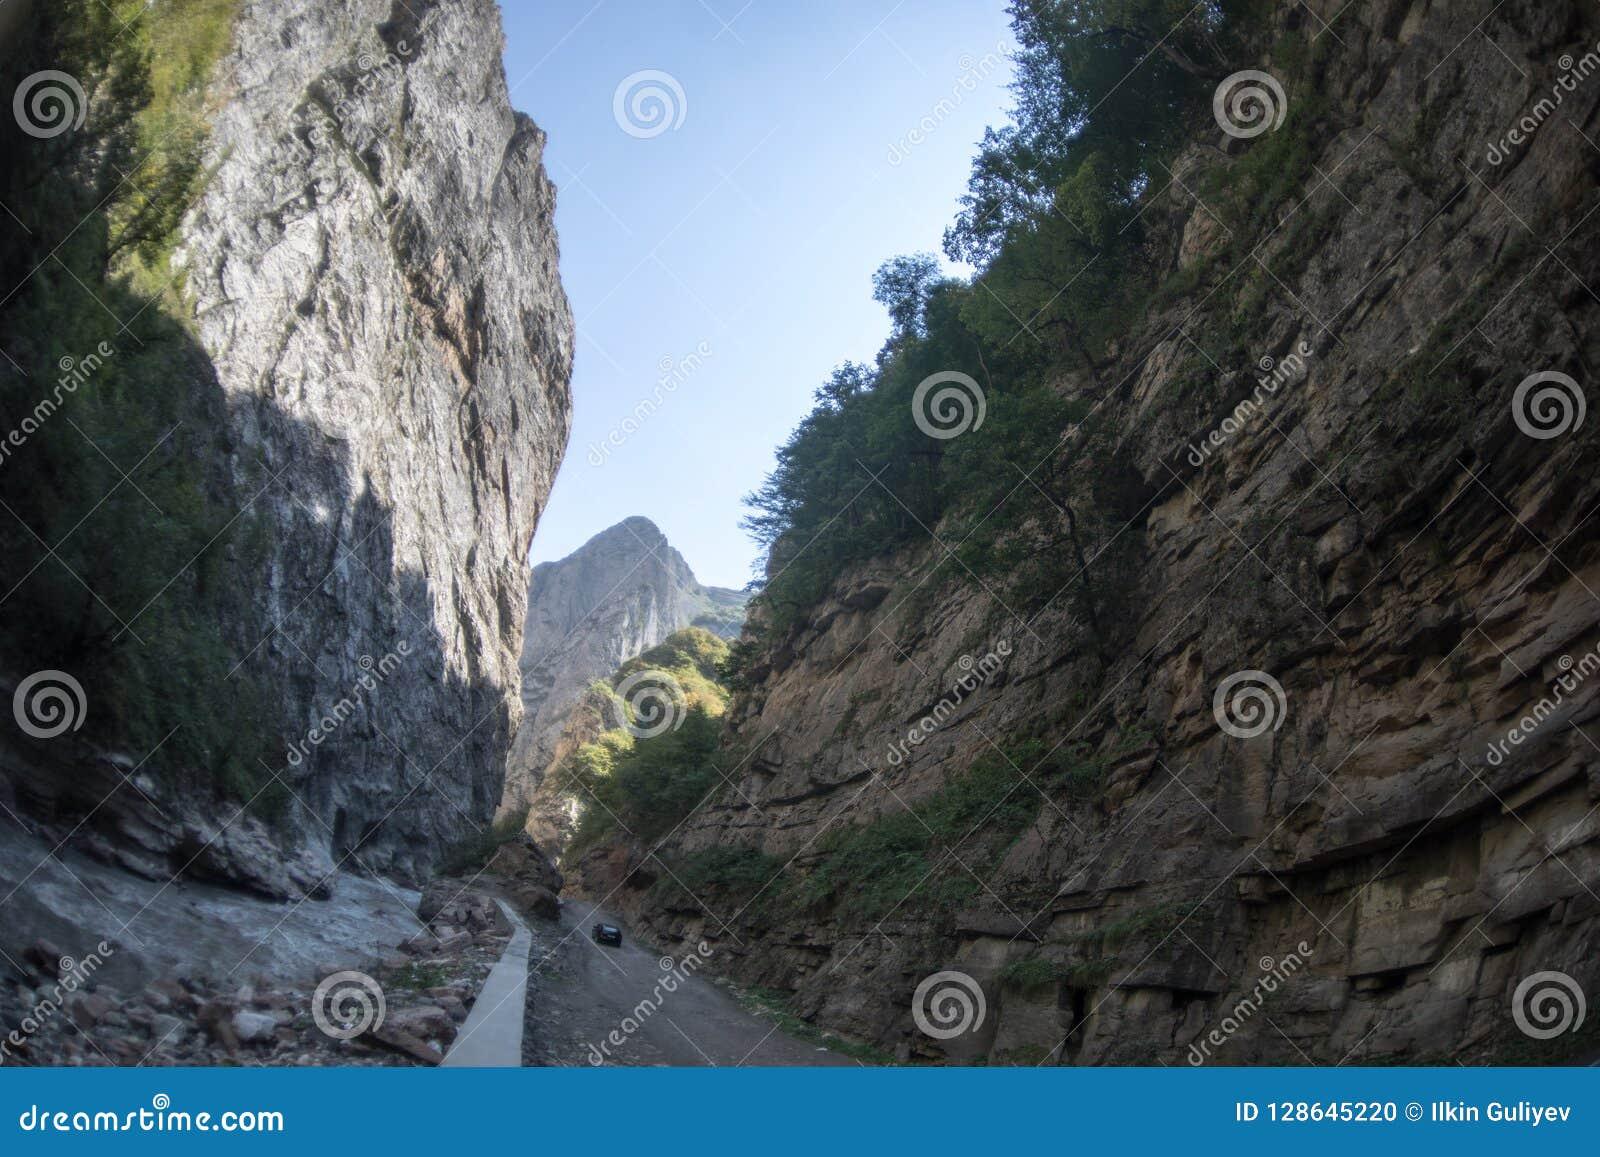 Cirkelende bergweg Nevelige bergweg in hooggebergte Bewolkte hemel met bergweg zomer